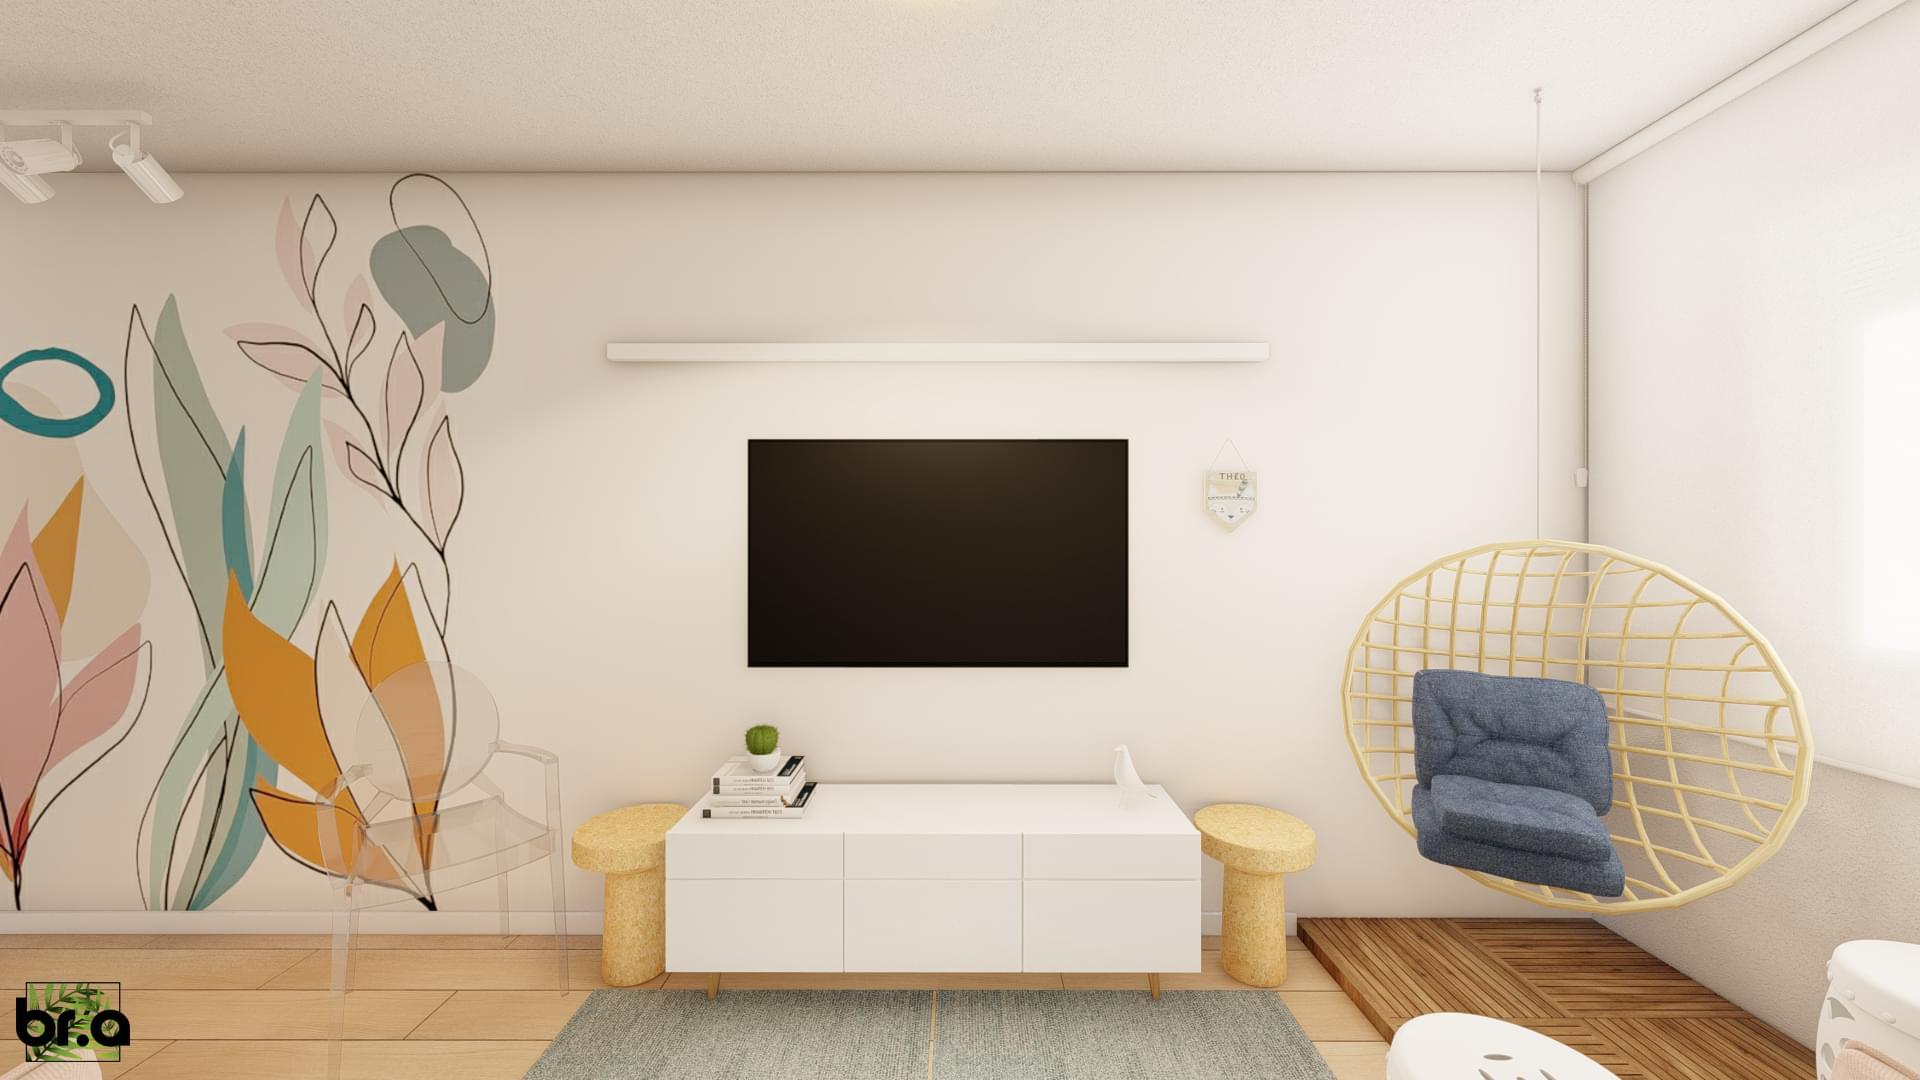 Residencia VP - Brasilidade | Projetos e Obras